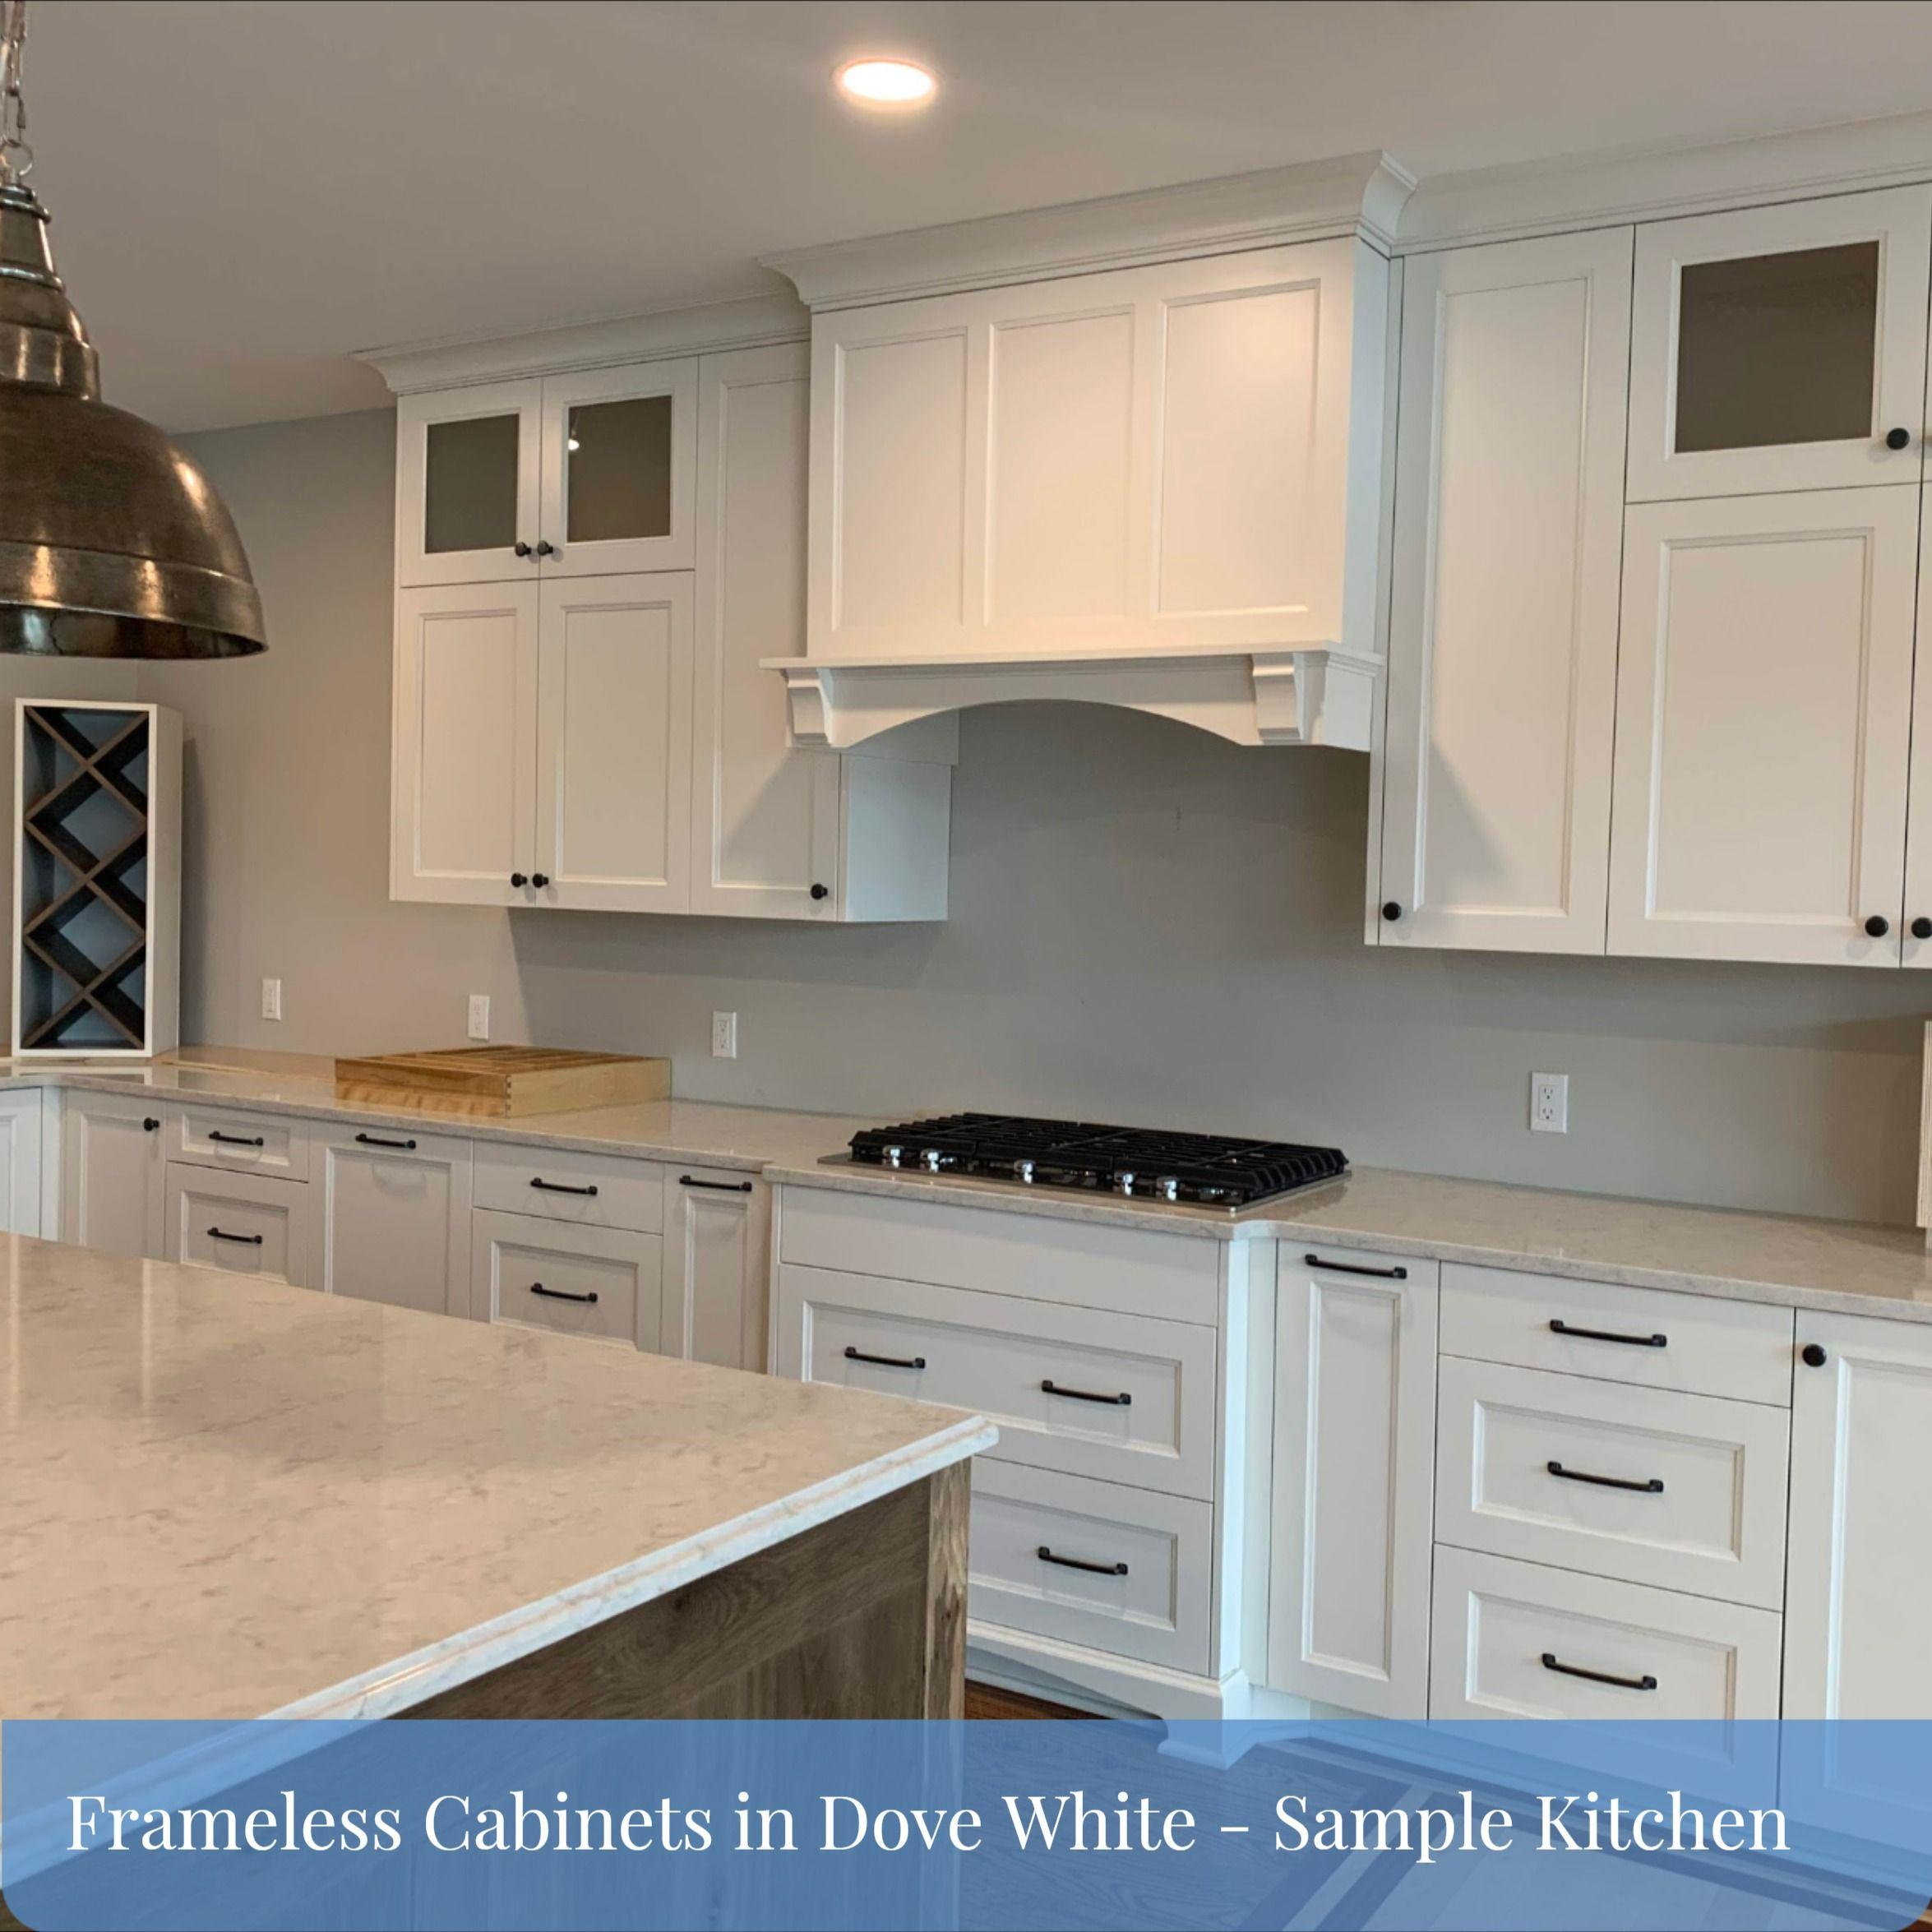 Custom Cabinet Showroom In 2020 Frameless Cabinets Frameless Kitchen Cabinets Kitchen Wall Storage